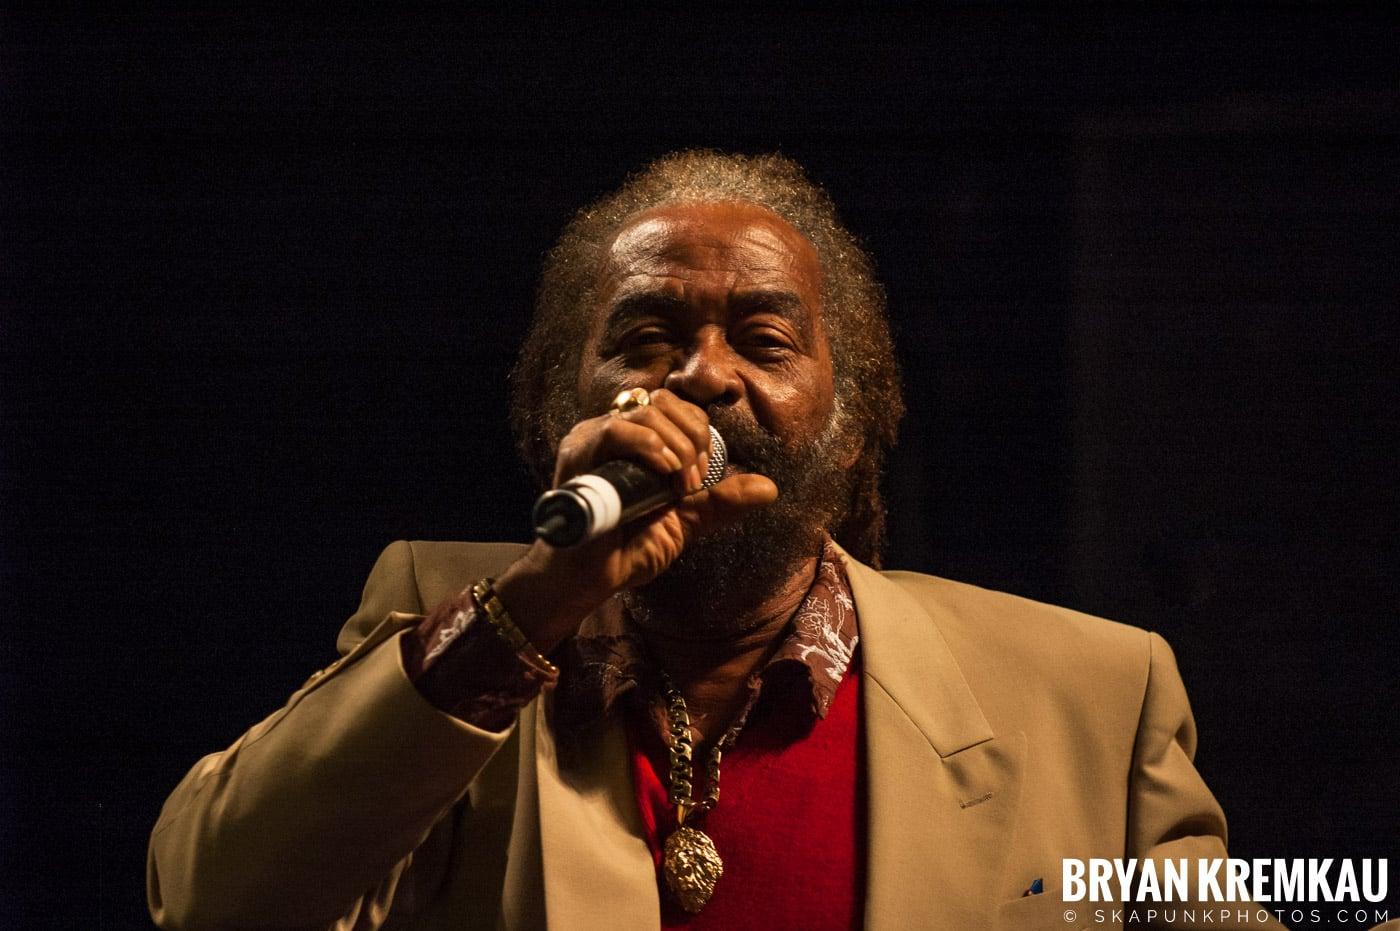 John Holt @ Vintage Reggae Fest - Hammerstein Ballroom, NYC - 12.16.07 (13)